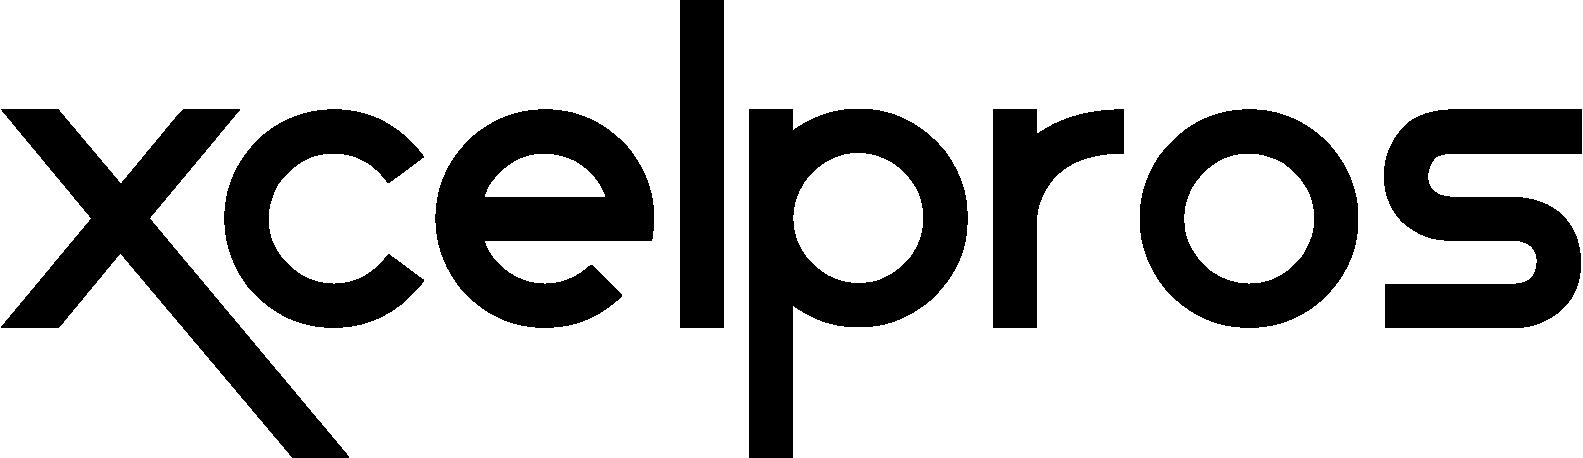 XcelPros Technologies Pvt Ltd